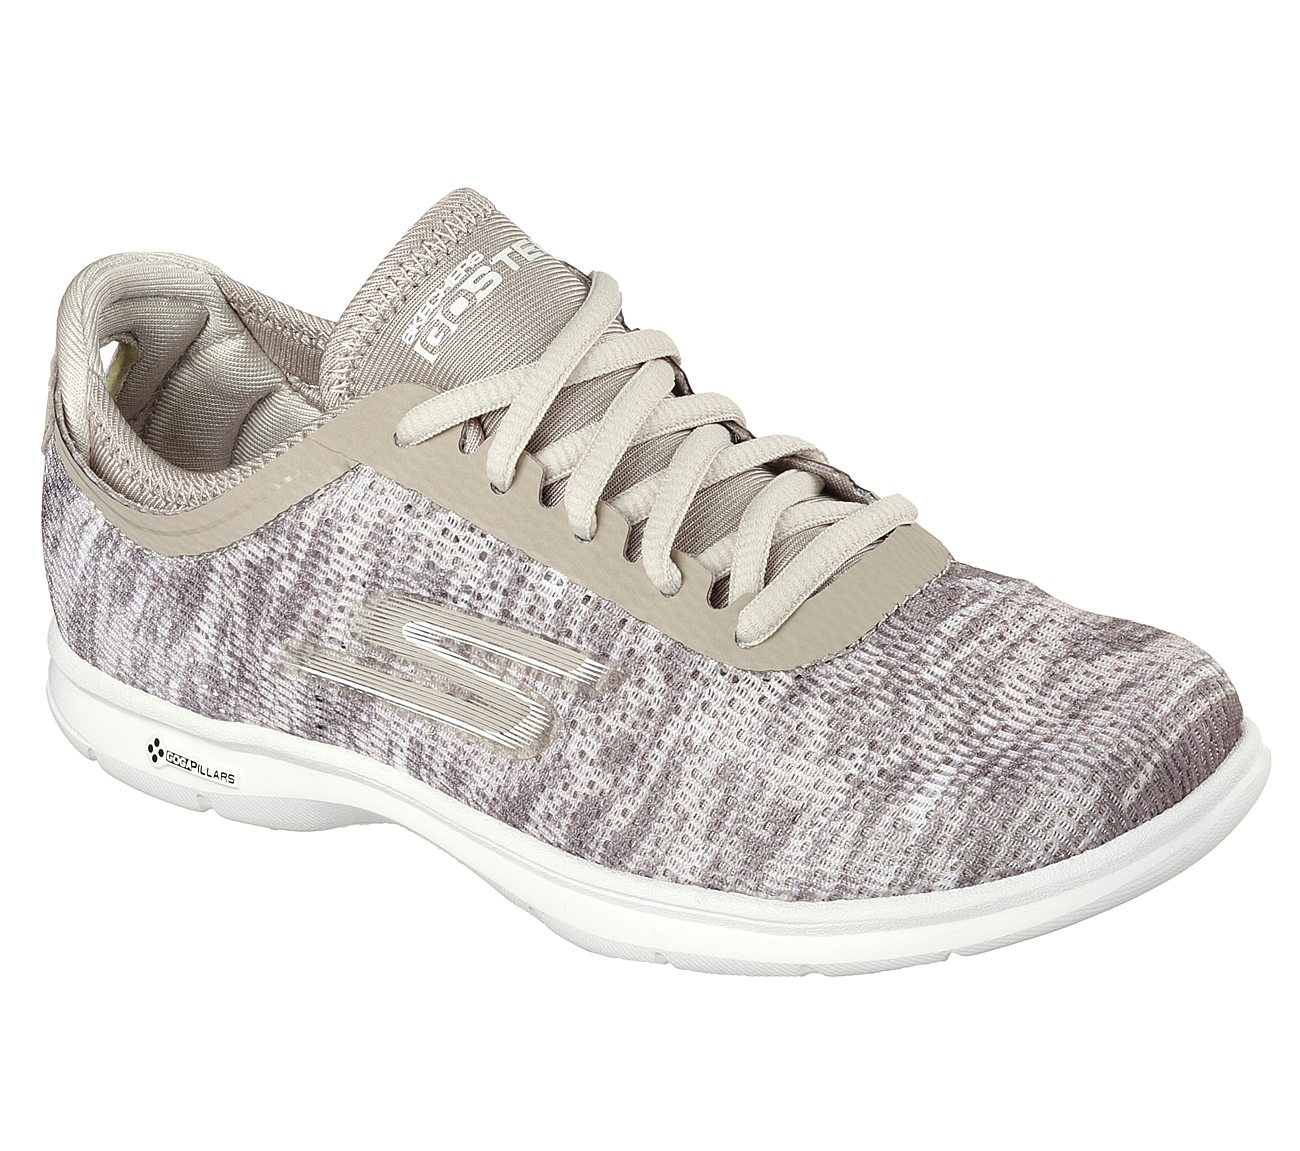 ba0e727c490c Buy SKECHERS Skechers GO STEP Skechers On the GO Shoes only £59.00